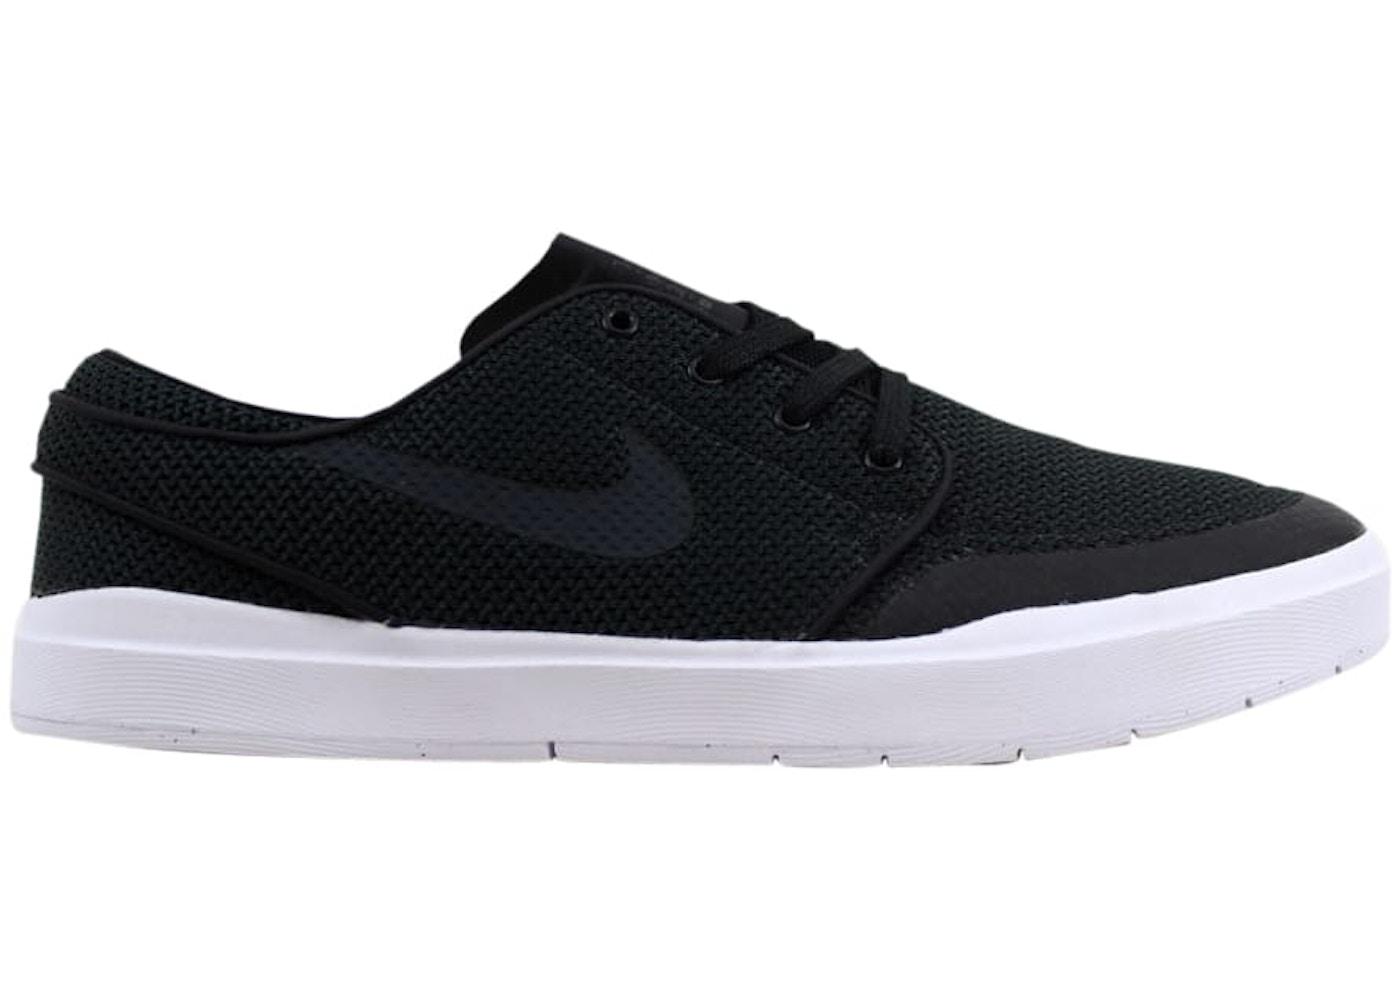 quality design fd6f5 d8232 Nike Stefan Janoski Hyperfeel XT Anthracite